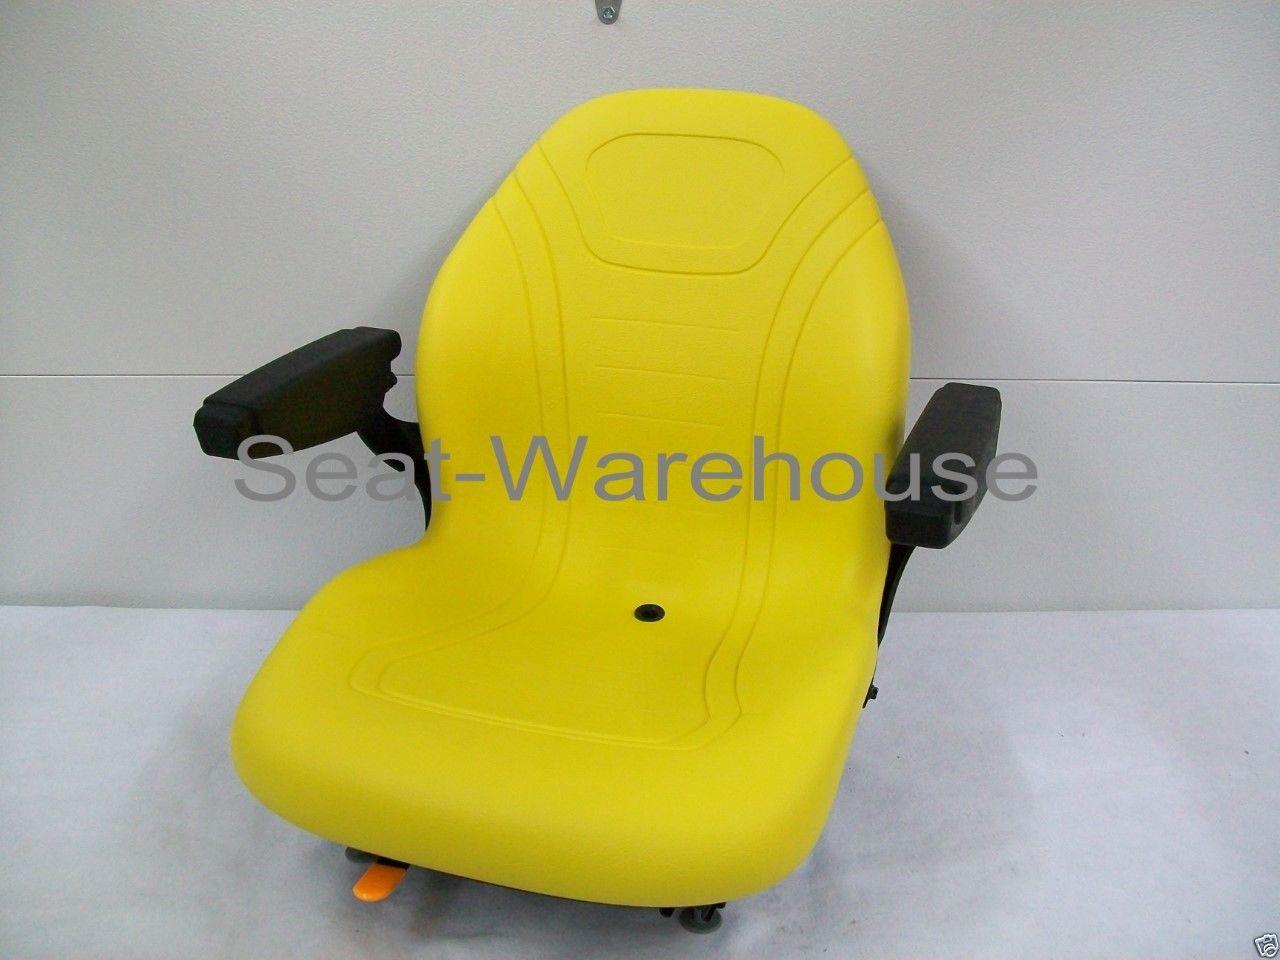 YELLOW SEAT FITS JOHN DEERE F620,F680,F687,717A,727A,737,757,M653,M655,M665  #LS